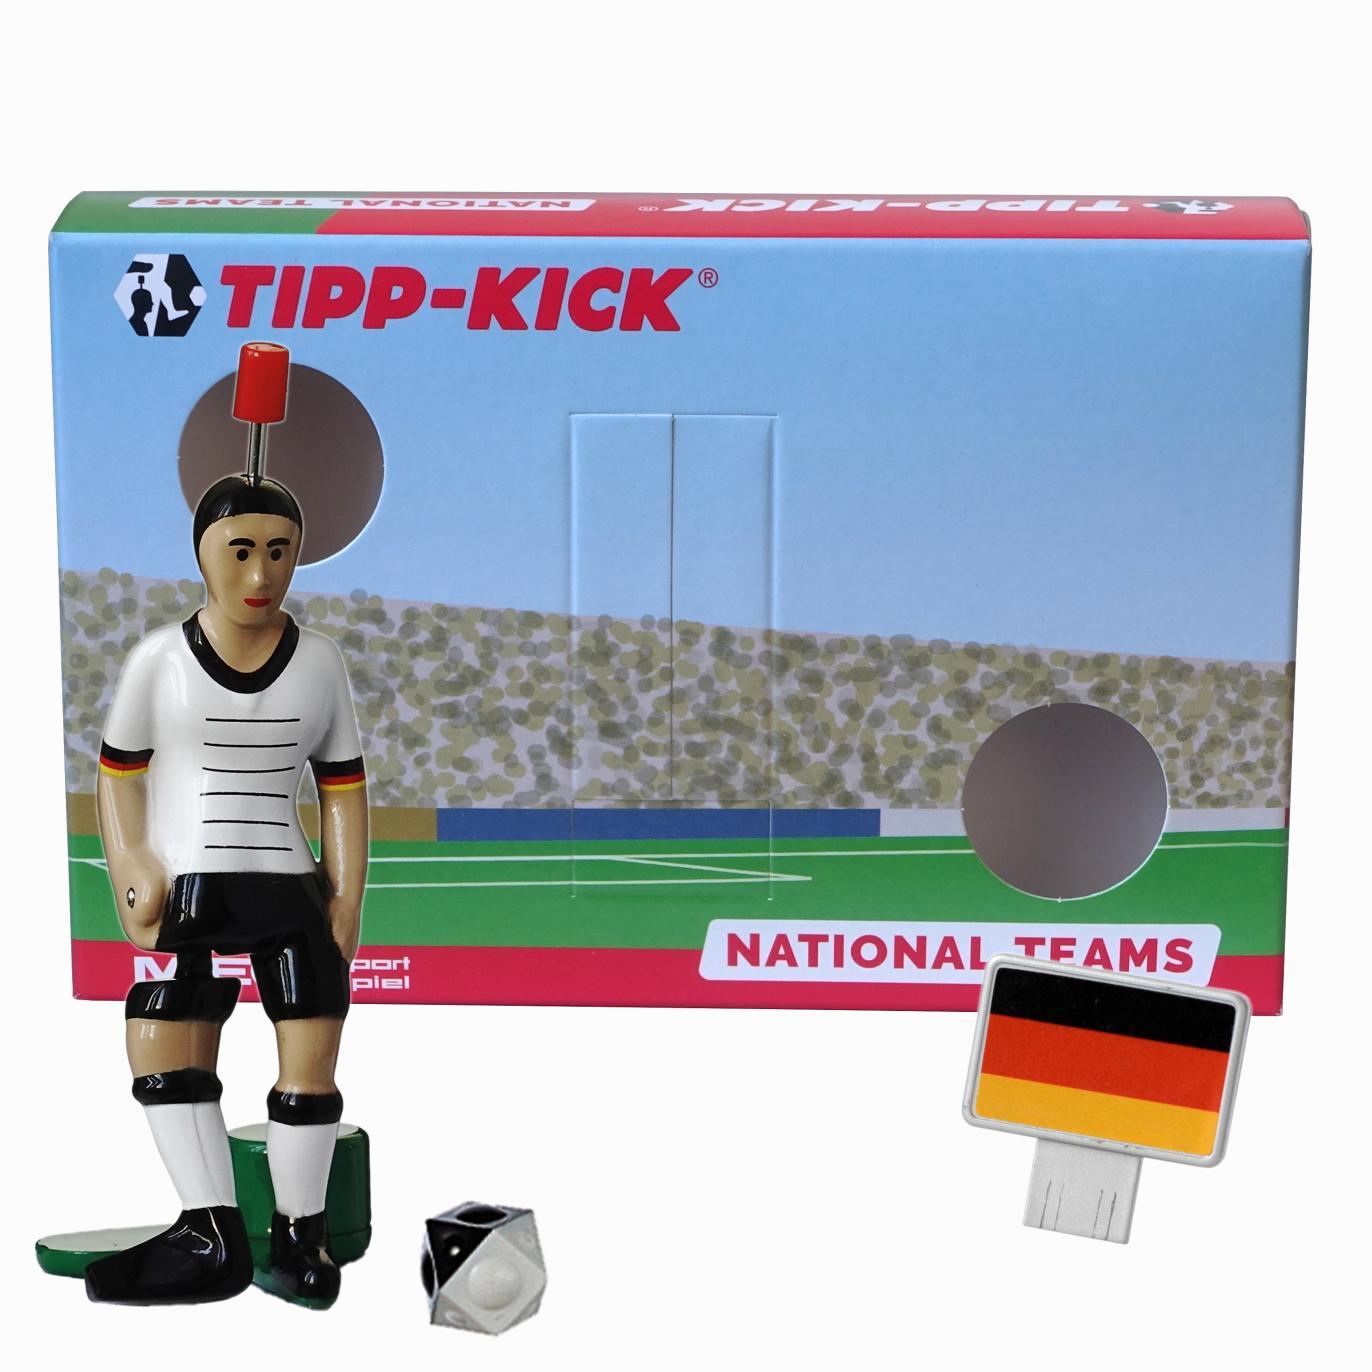 Top-Kicker Star-Kicker /& TIPP-KICK Torwart I Kick-TIPP Zubeh/ör TIPP-KICK WM Classics Weltmeister Deutschland 1990 Spieler-Set Kicker